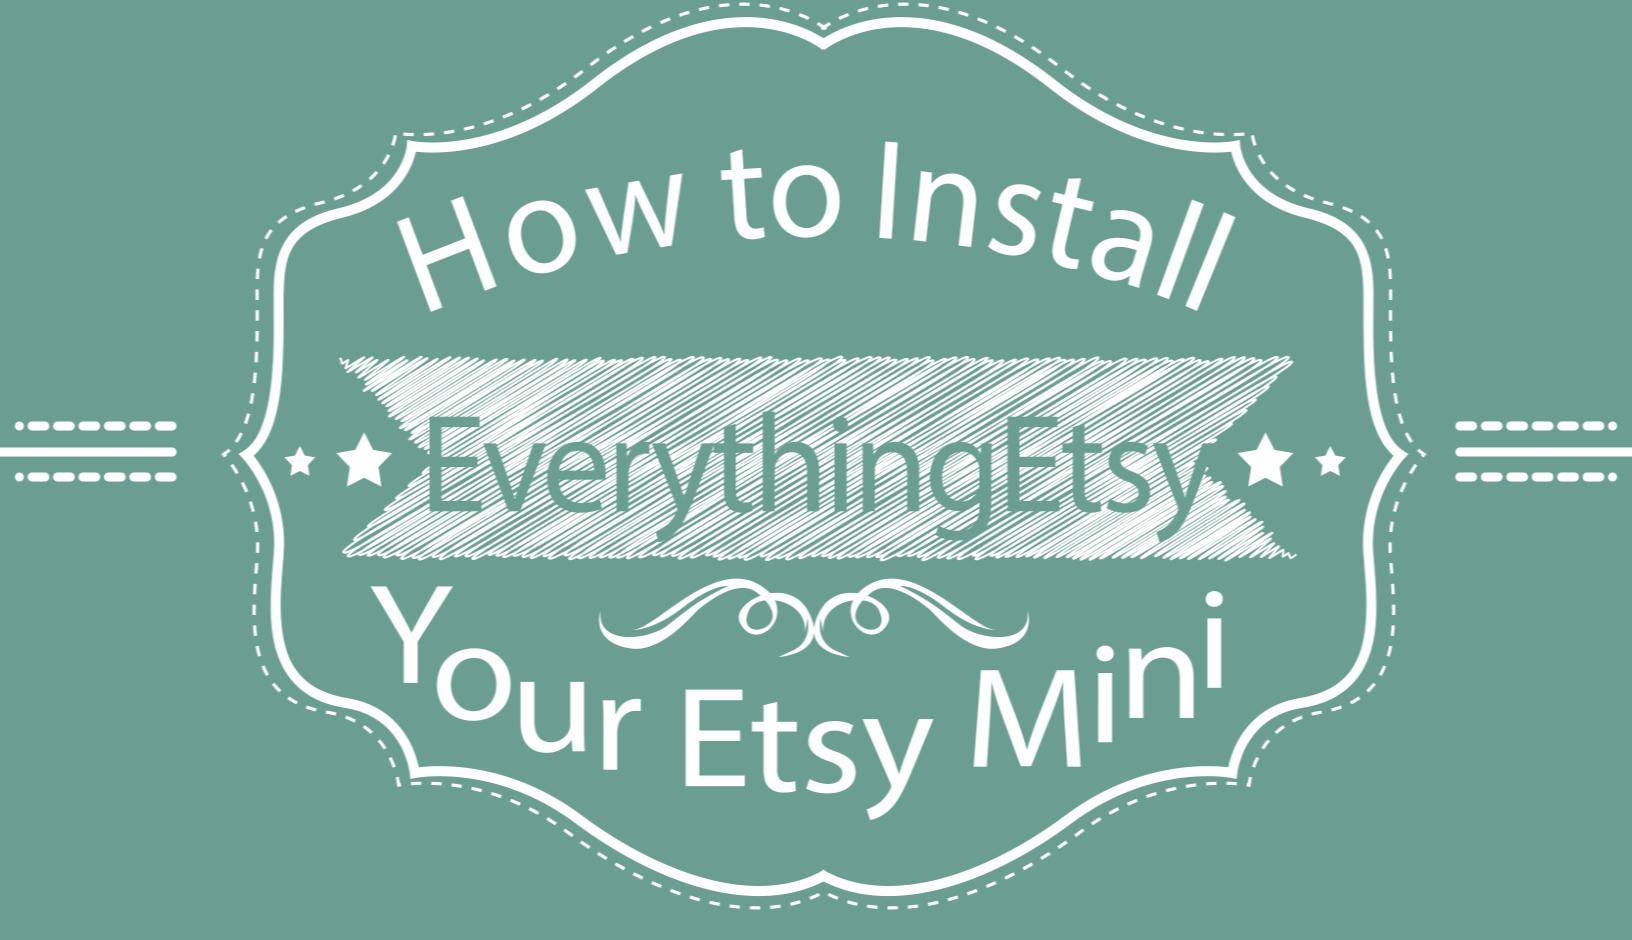 Etsy Mini Video Cover